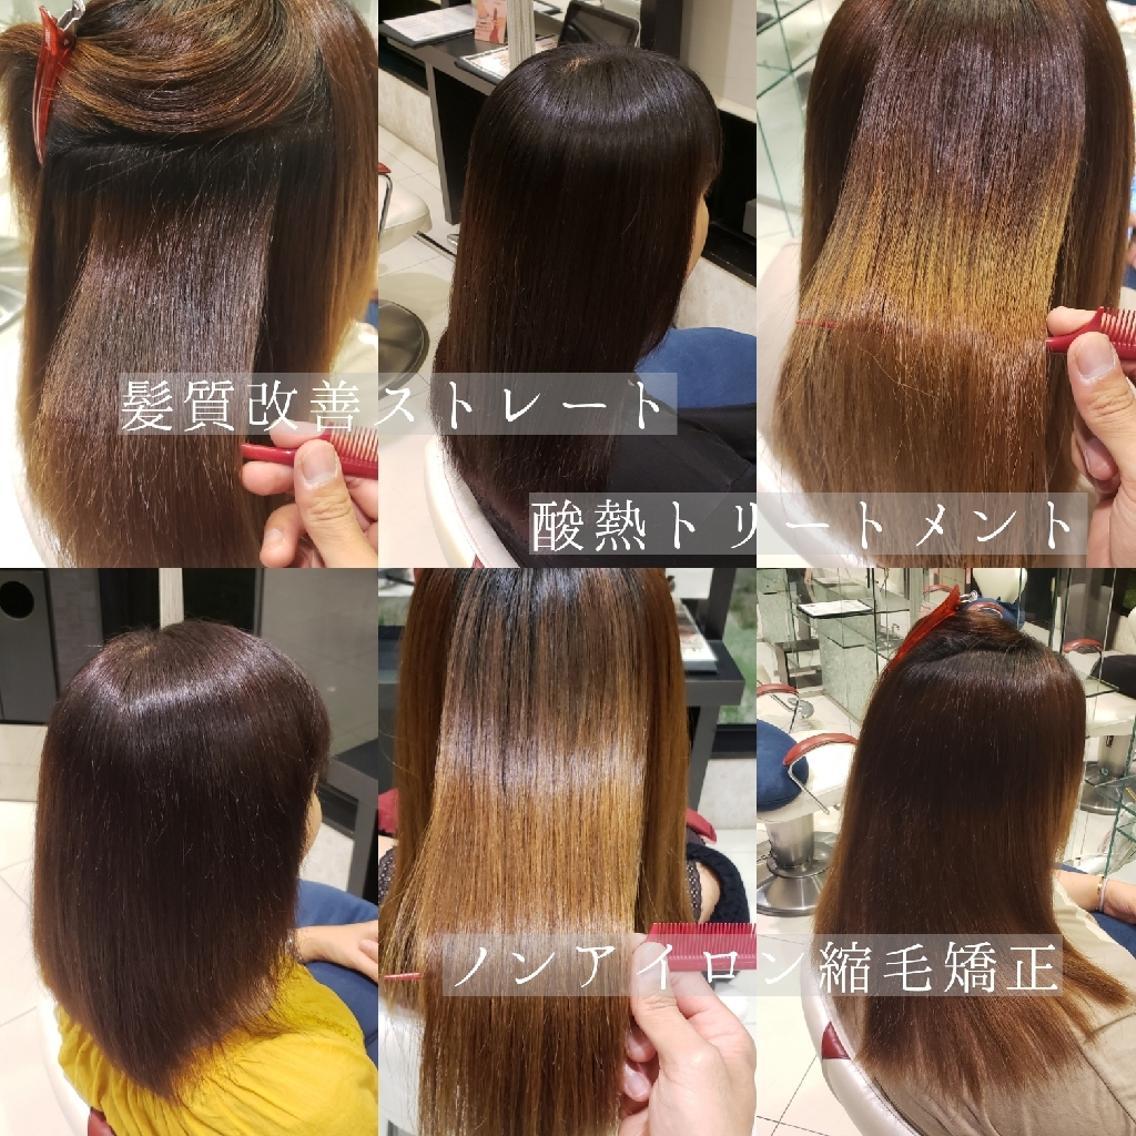 EARTH 松本庄内店所属・🍀✨髪質改善美容師 ✨🍀鈴木昌浩の掲載